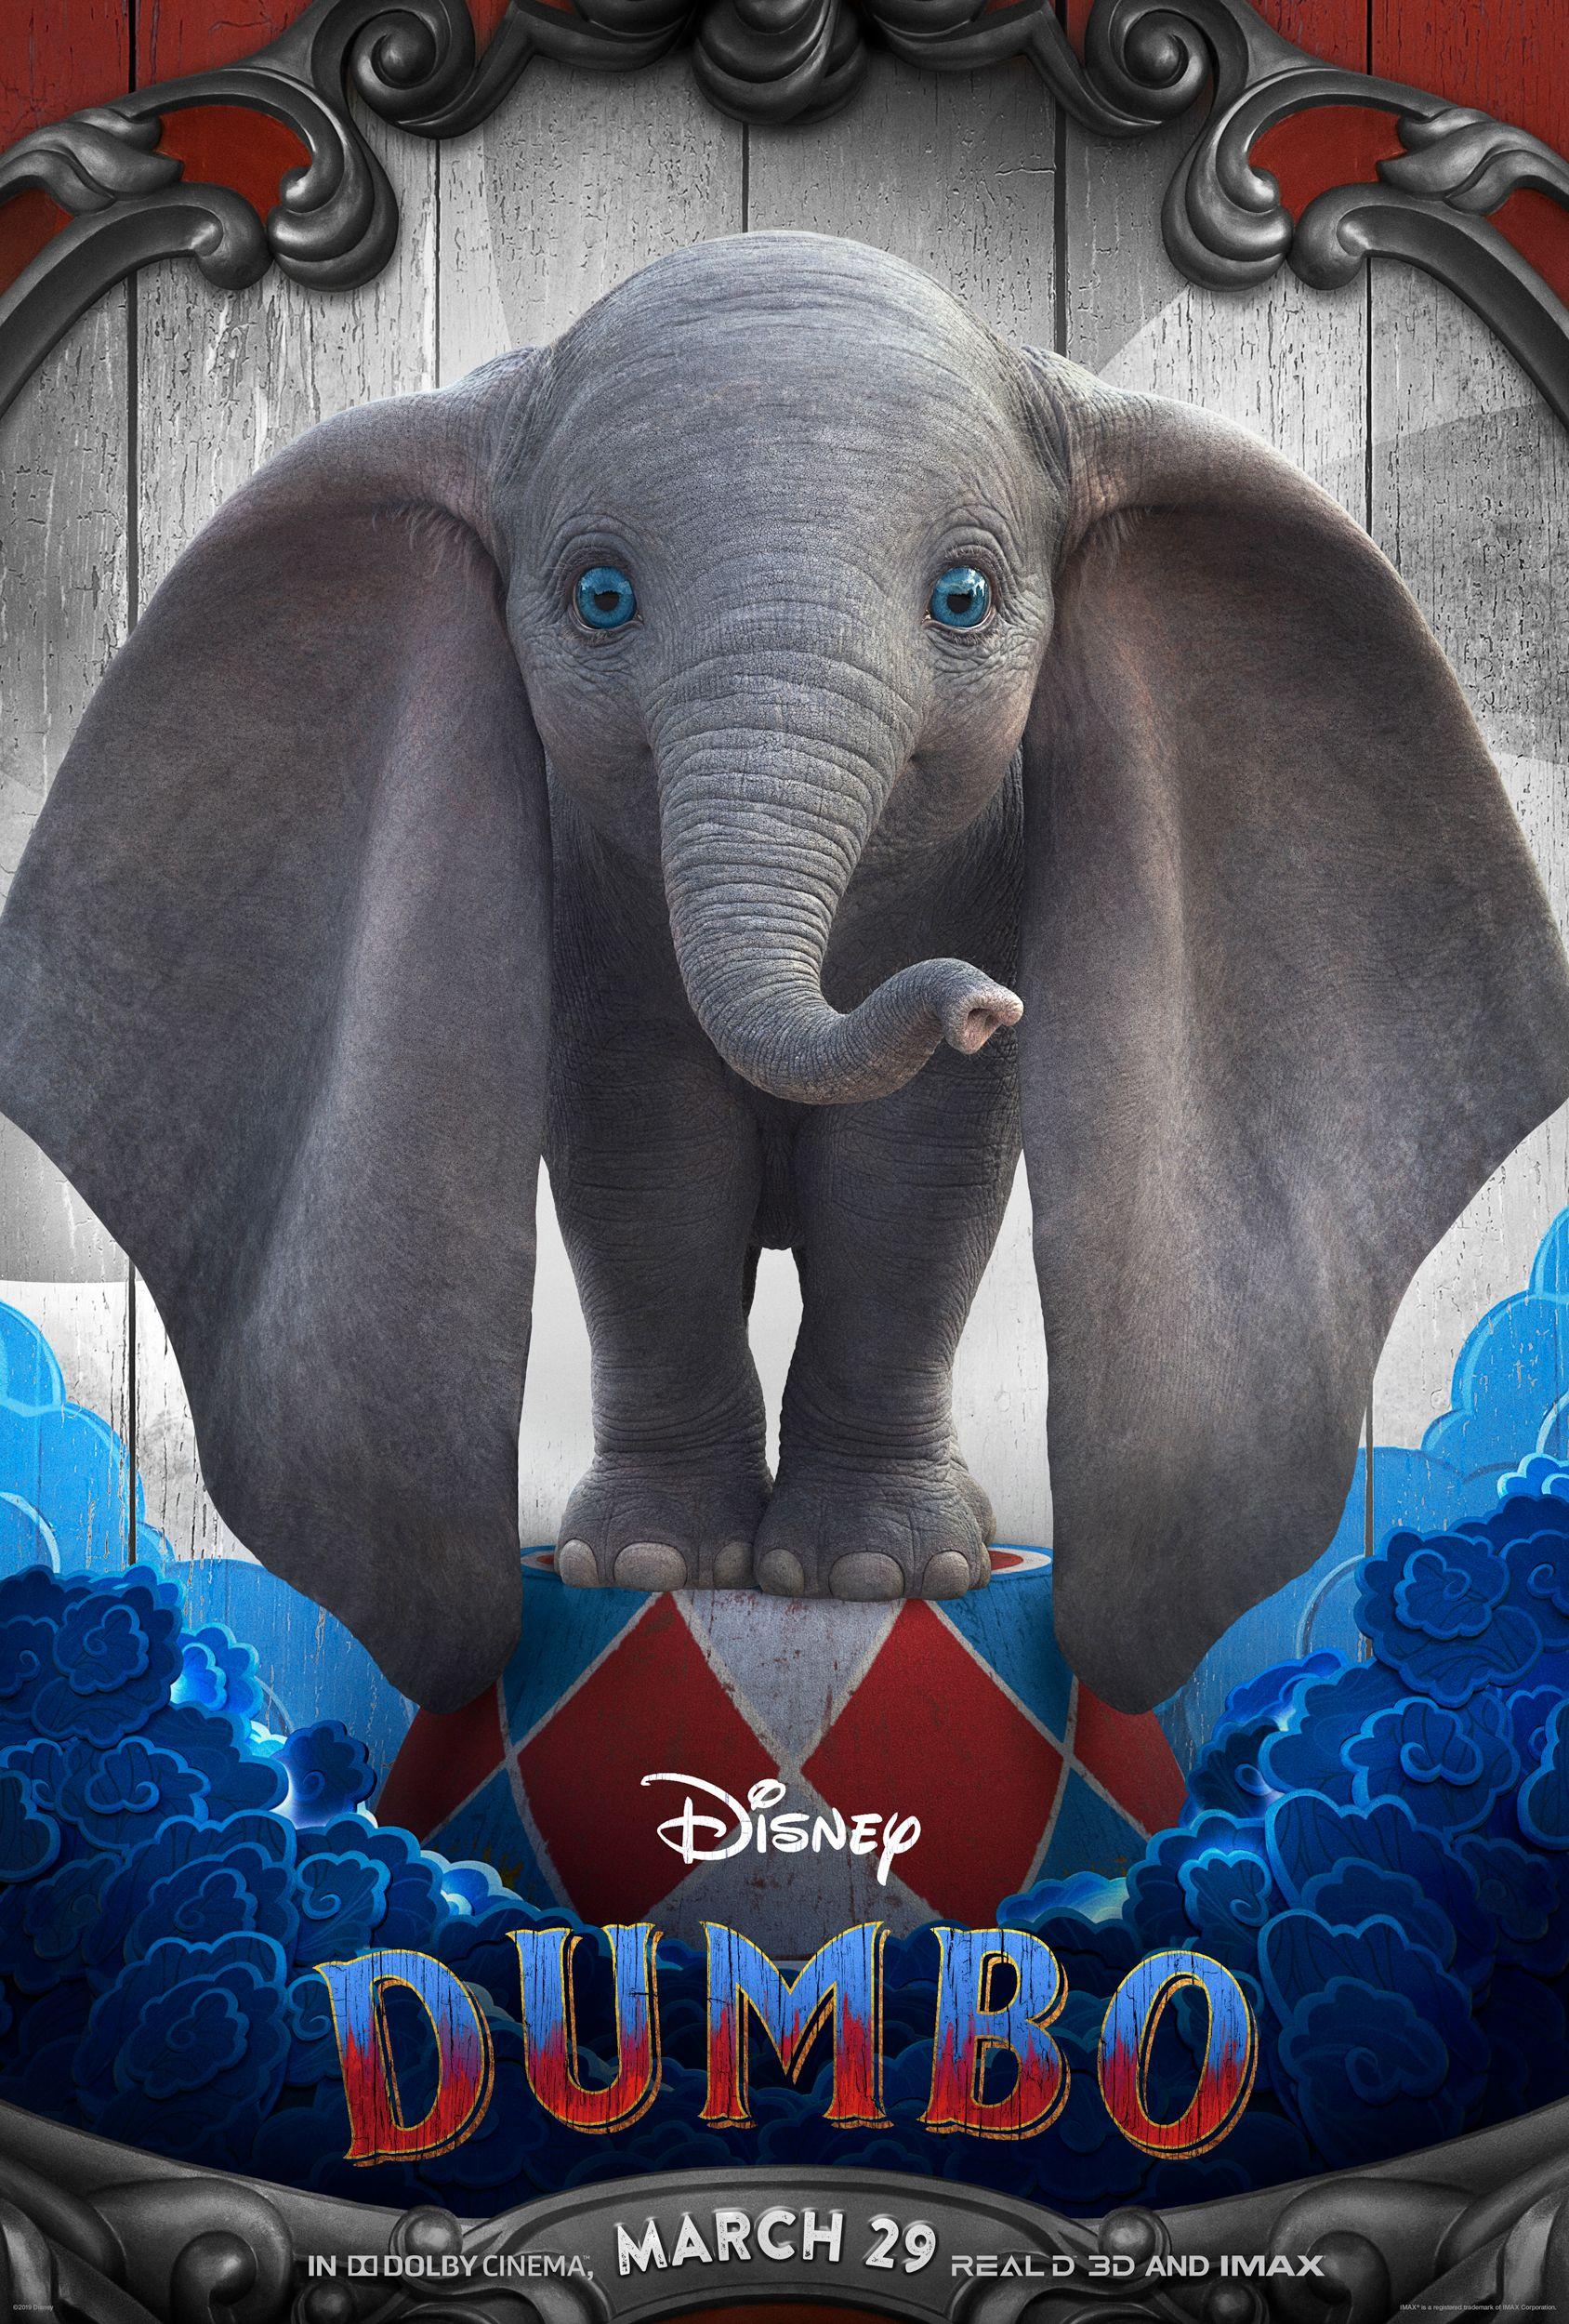 dumbo character posters reveal tim burton u0026 39 s whimsical take